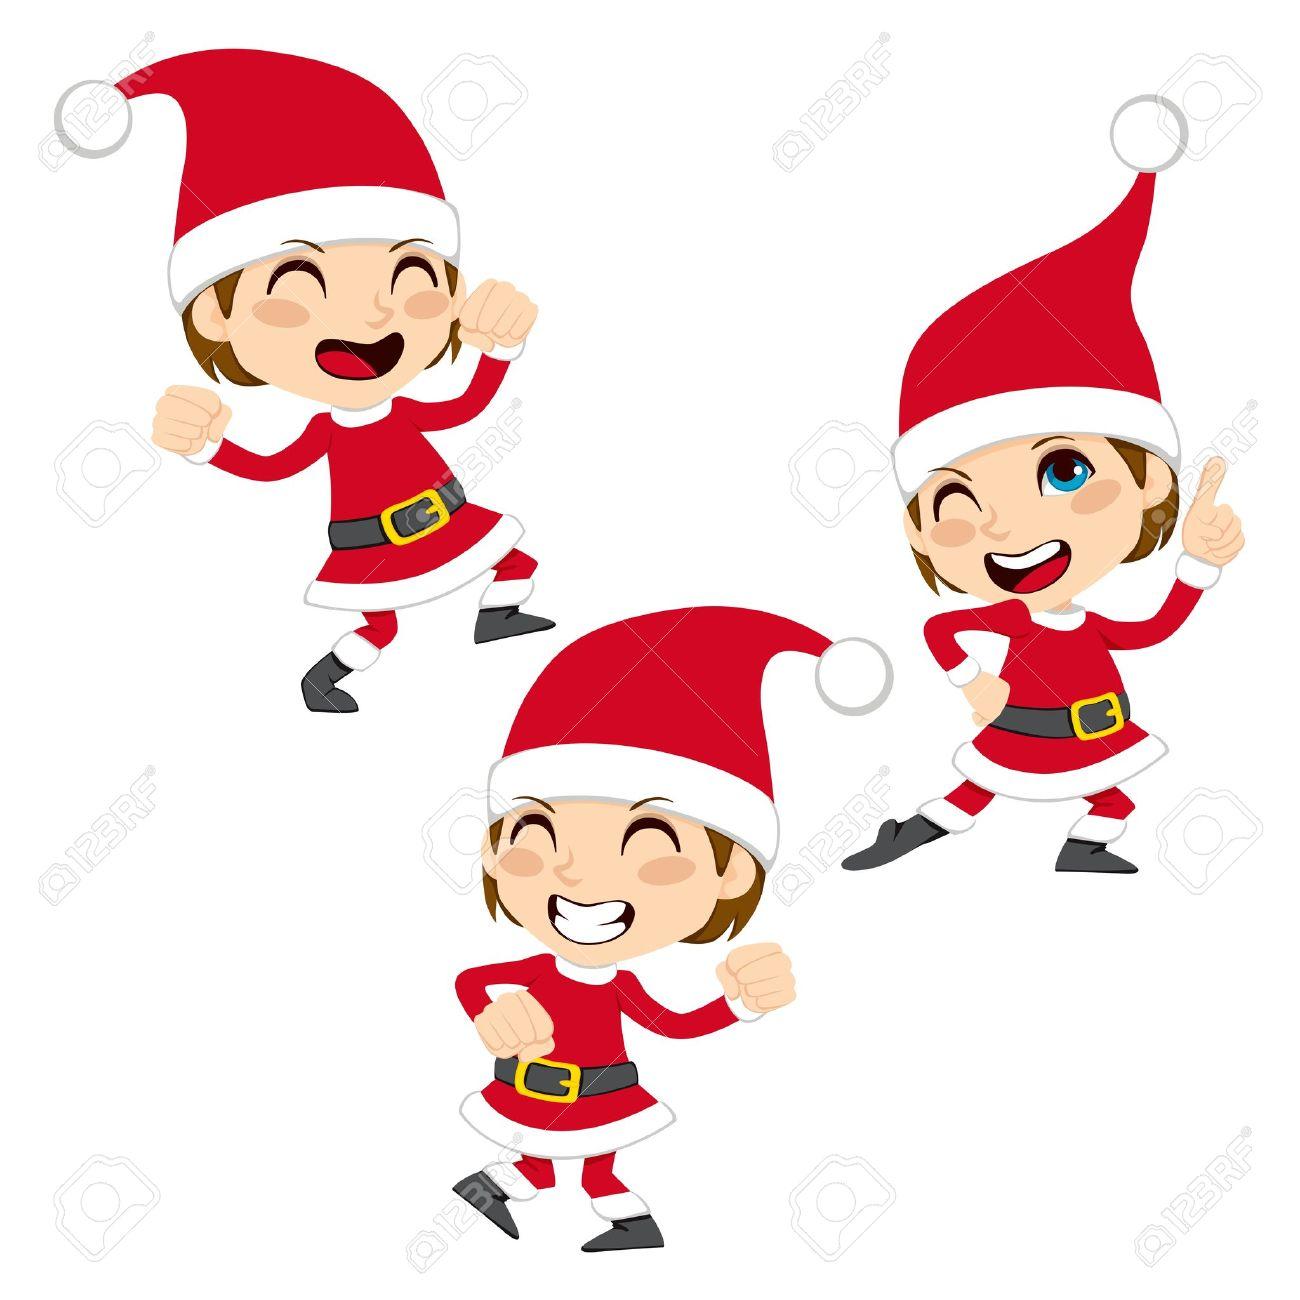 Cute little boy happy dancing Santa Claus Christmas dance.